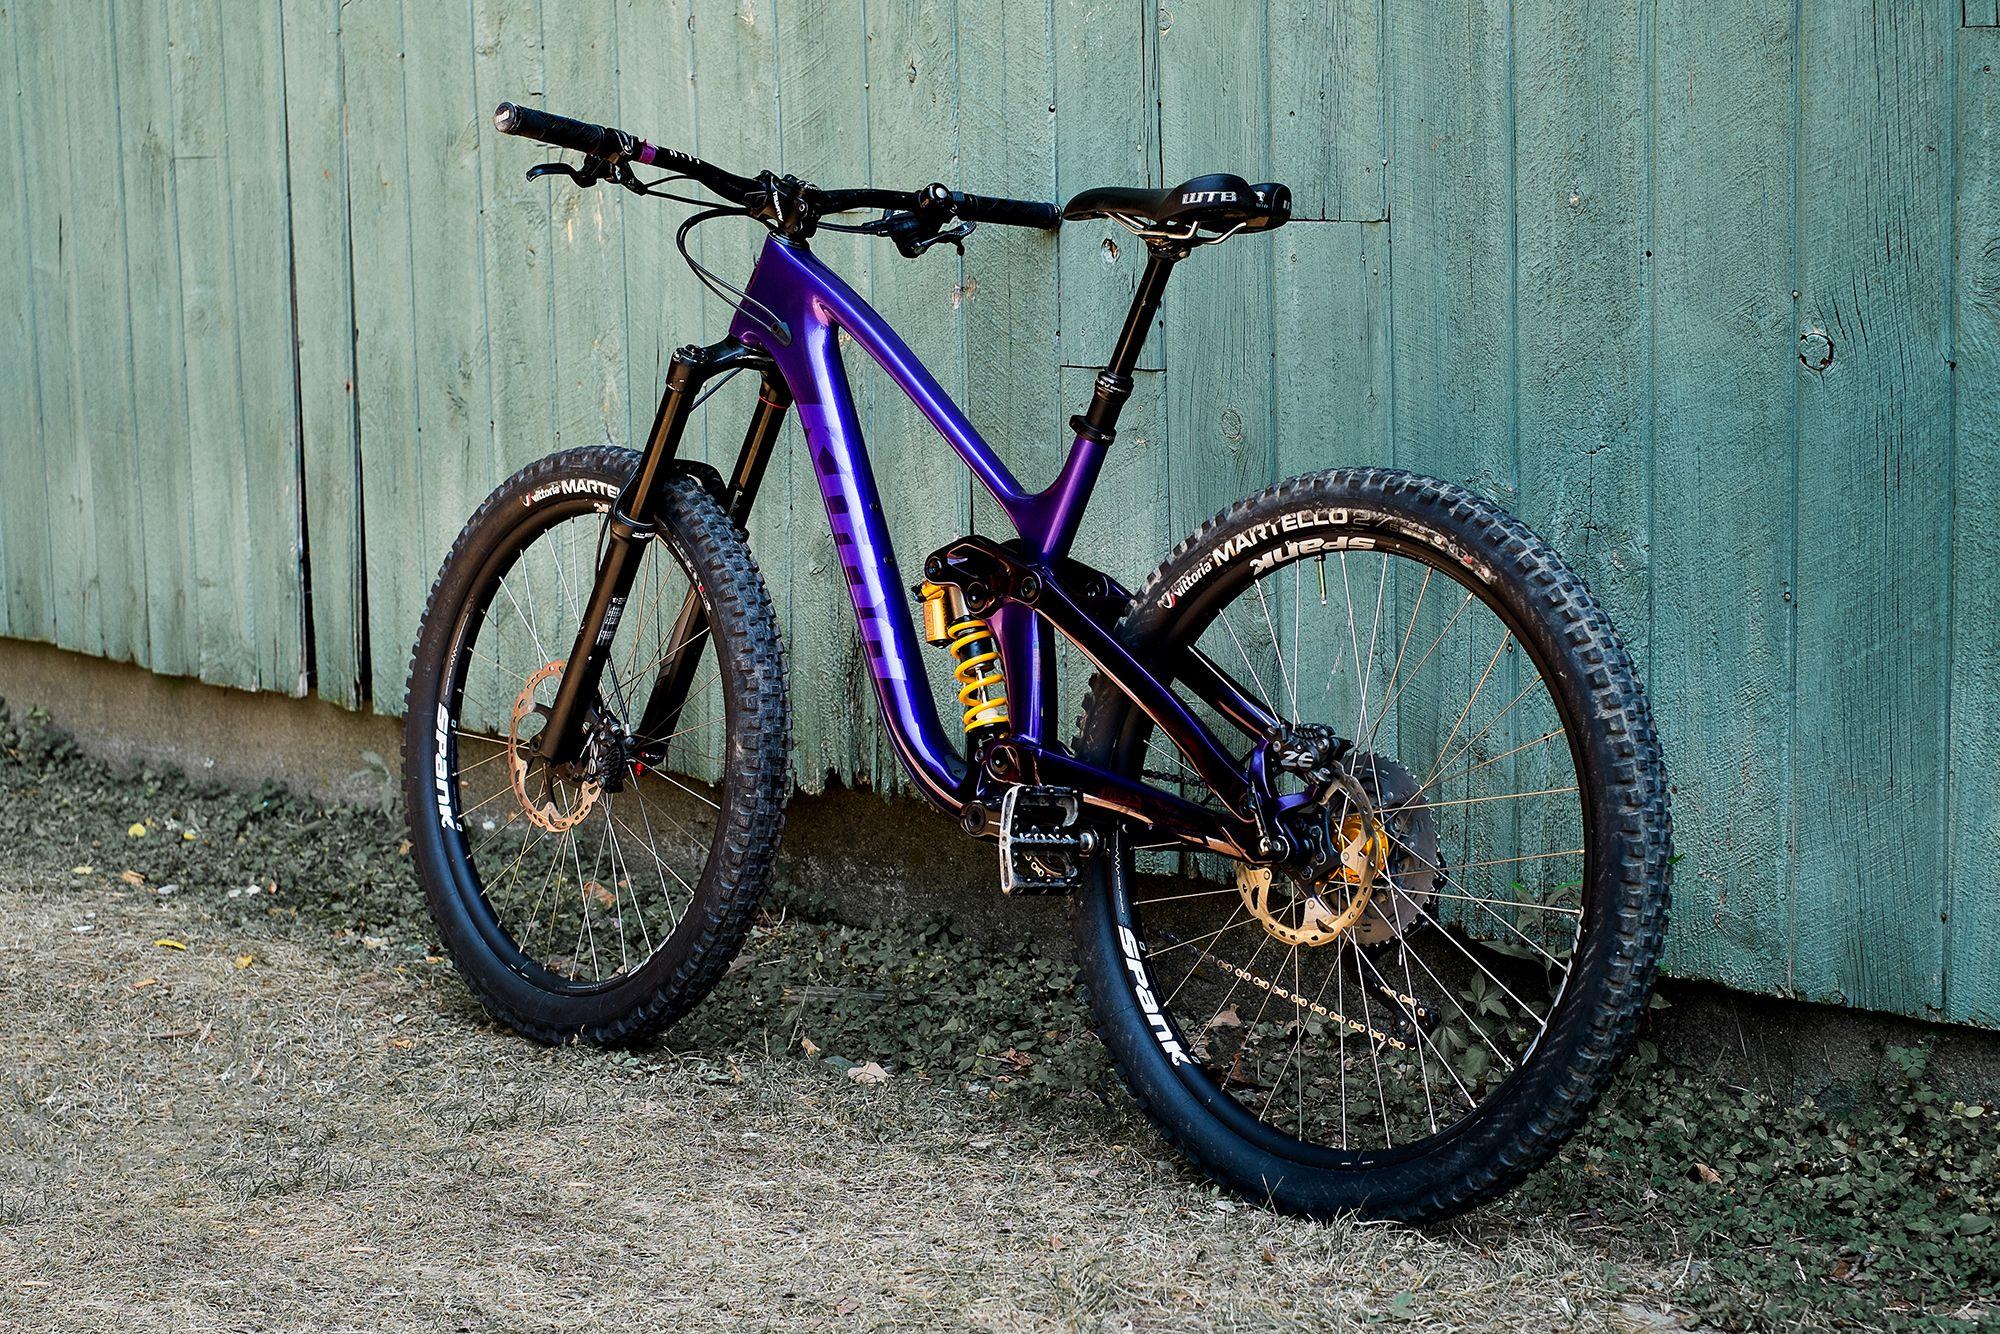 8fe3aa87d13 Kona Dream Builds: Rich's Deep Purple Process 153 CR 27.5 | bicycles ...